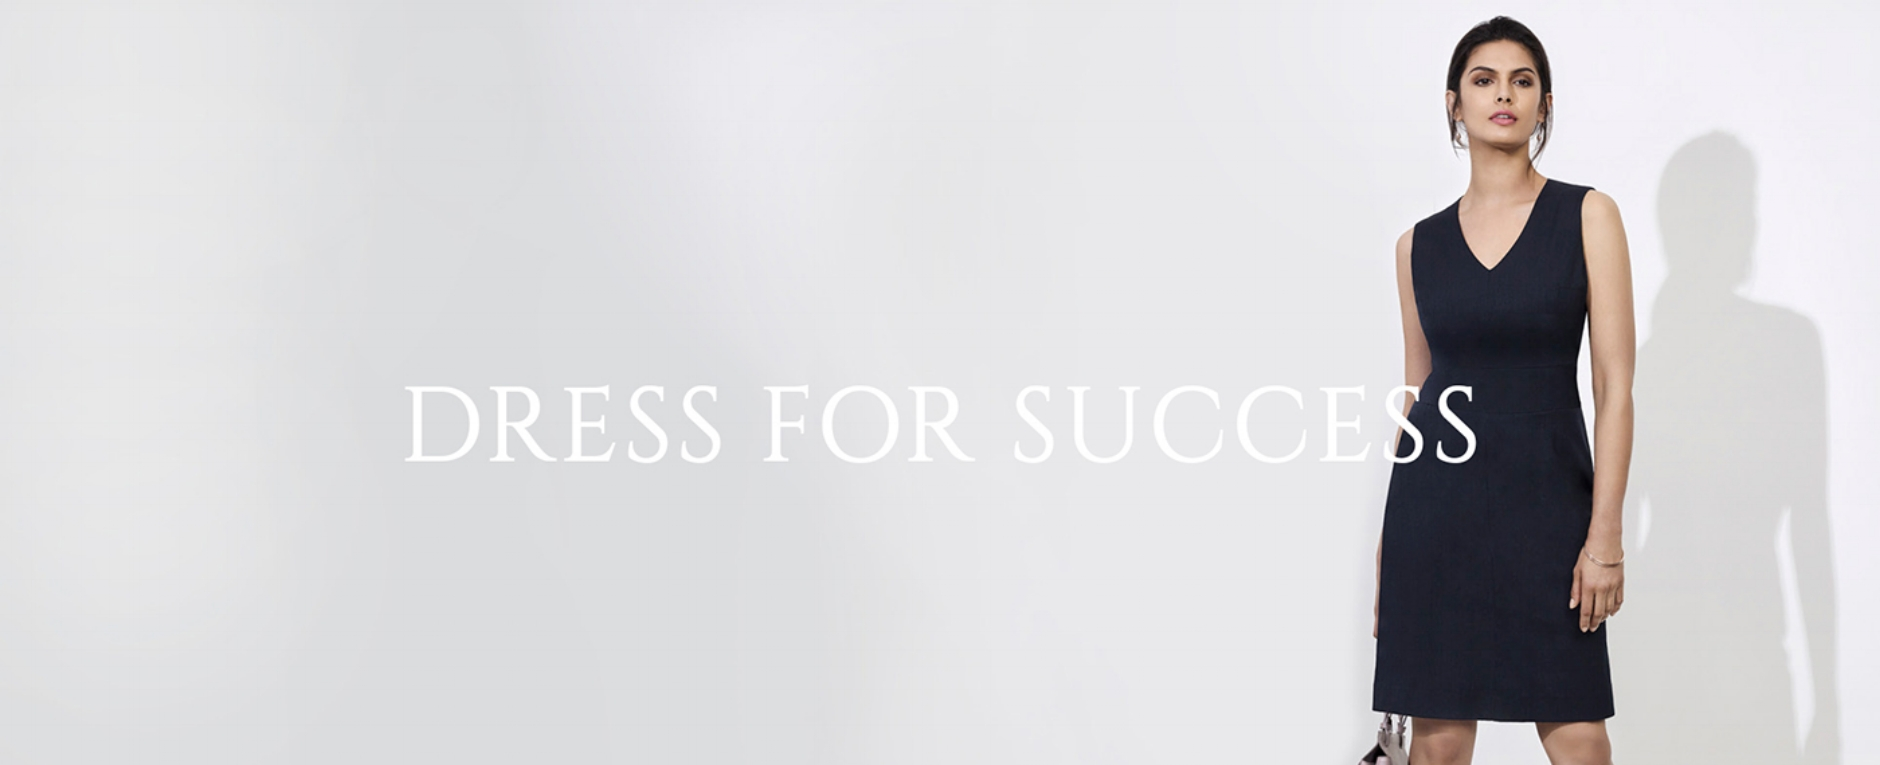 biz dress for success.jpg